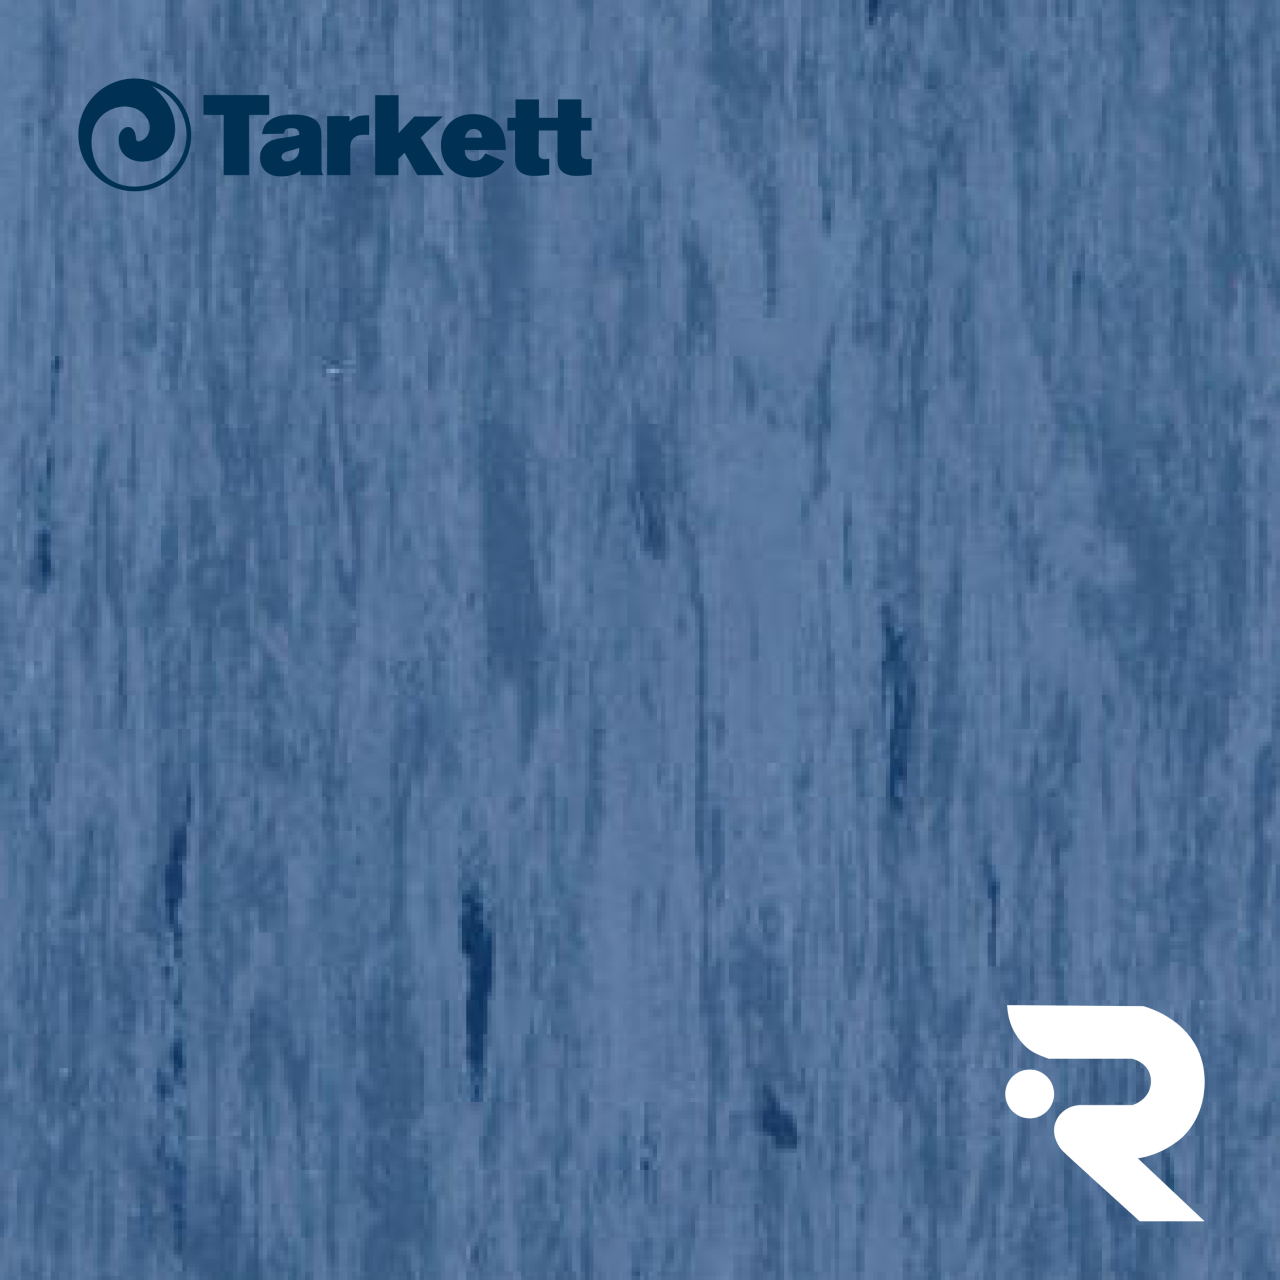 🏫 Гомогенний лінолеум Tarkett | Standard DARK BLUE 0493 | Standard Plus 2.0 mm | 610 х 610 мм